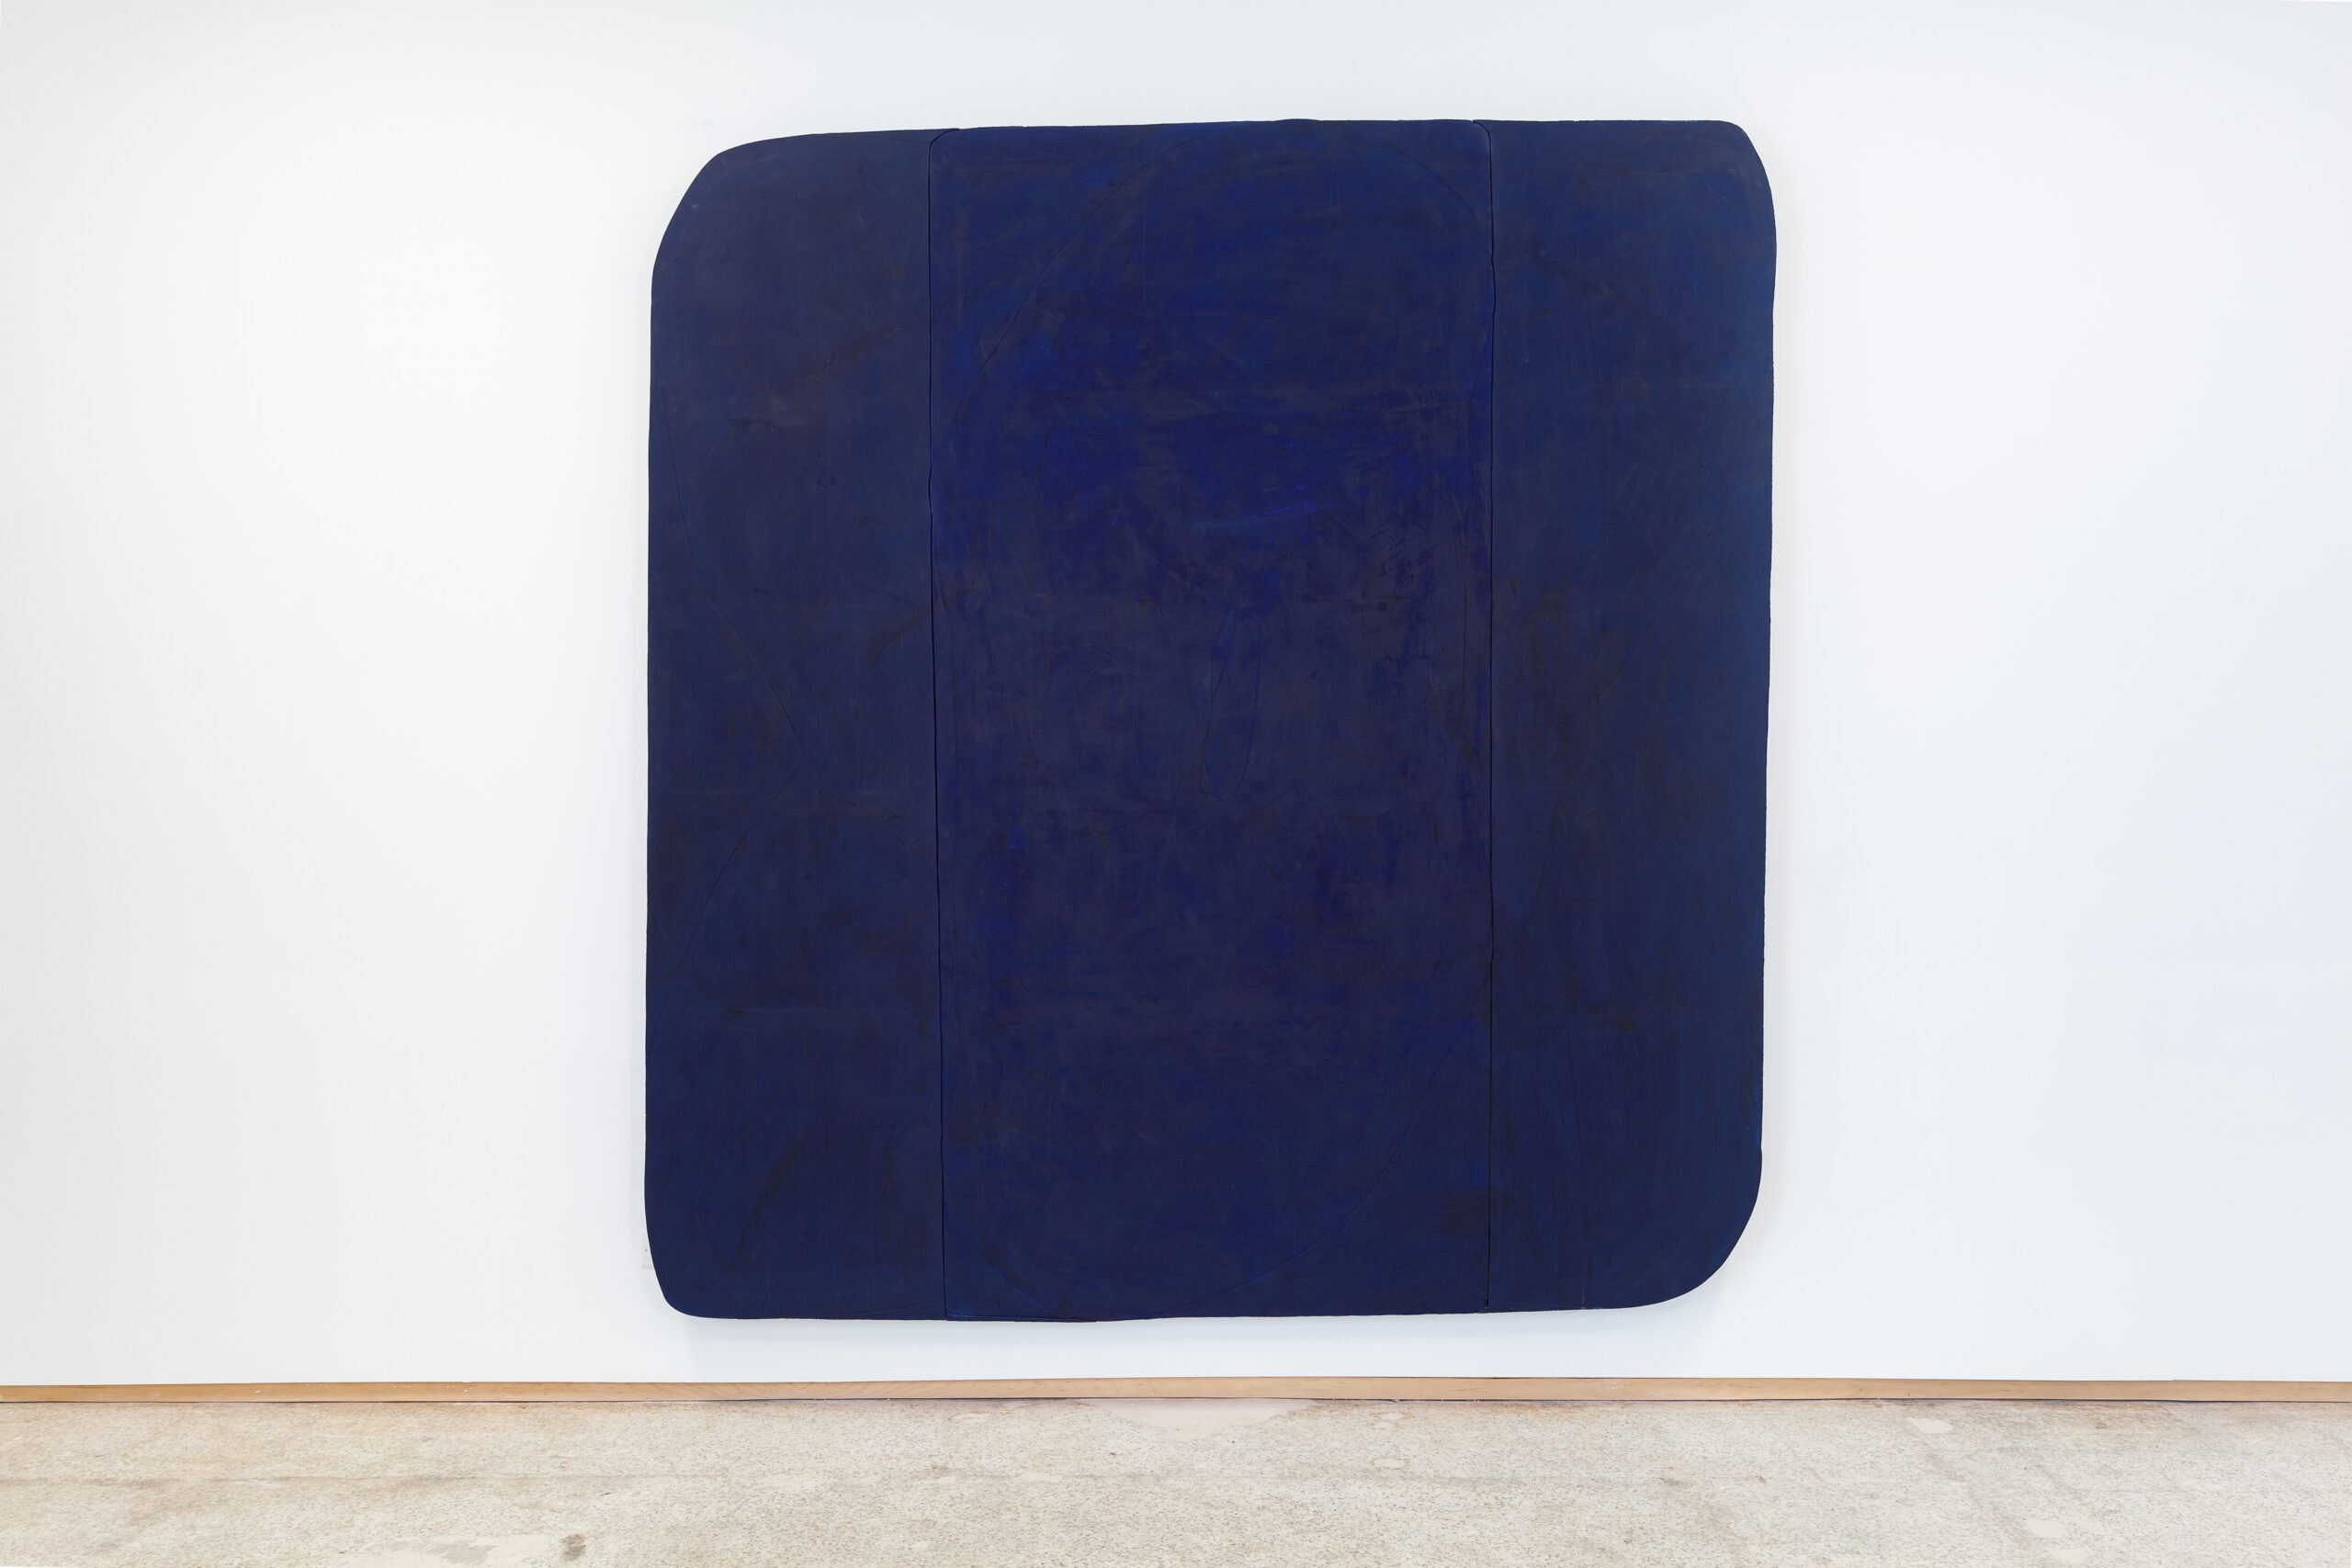 Robert Thiele, Untitled (Blue), 1999